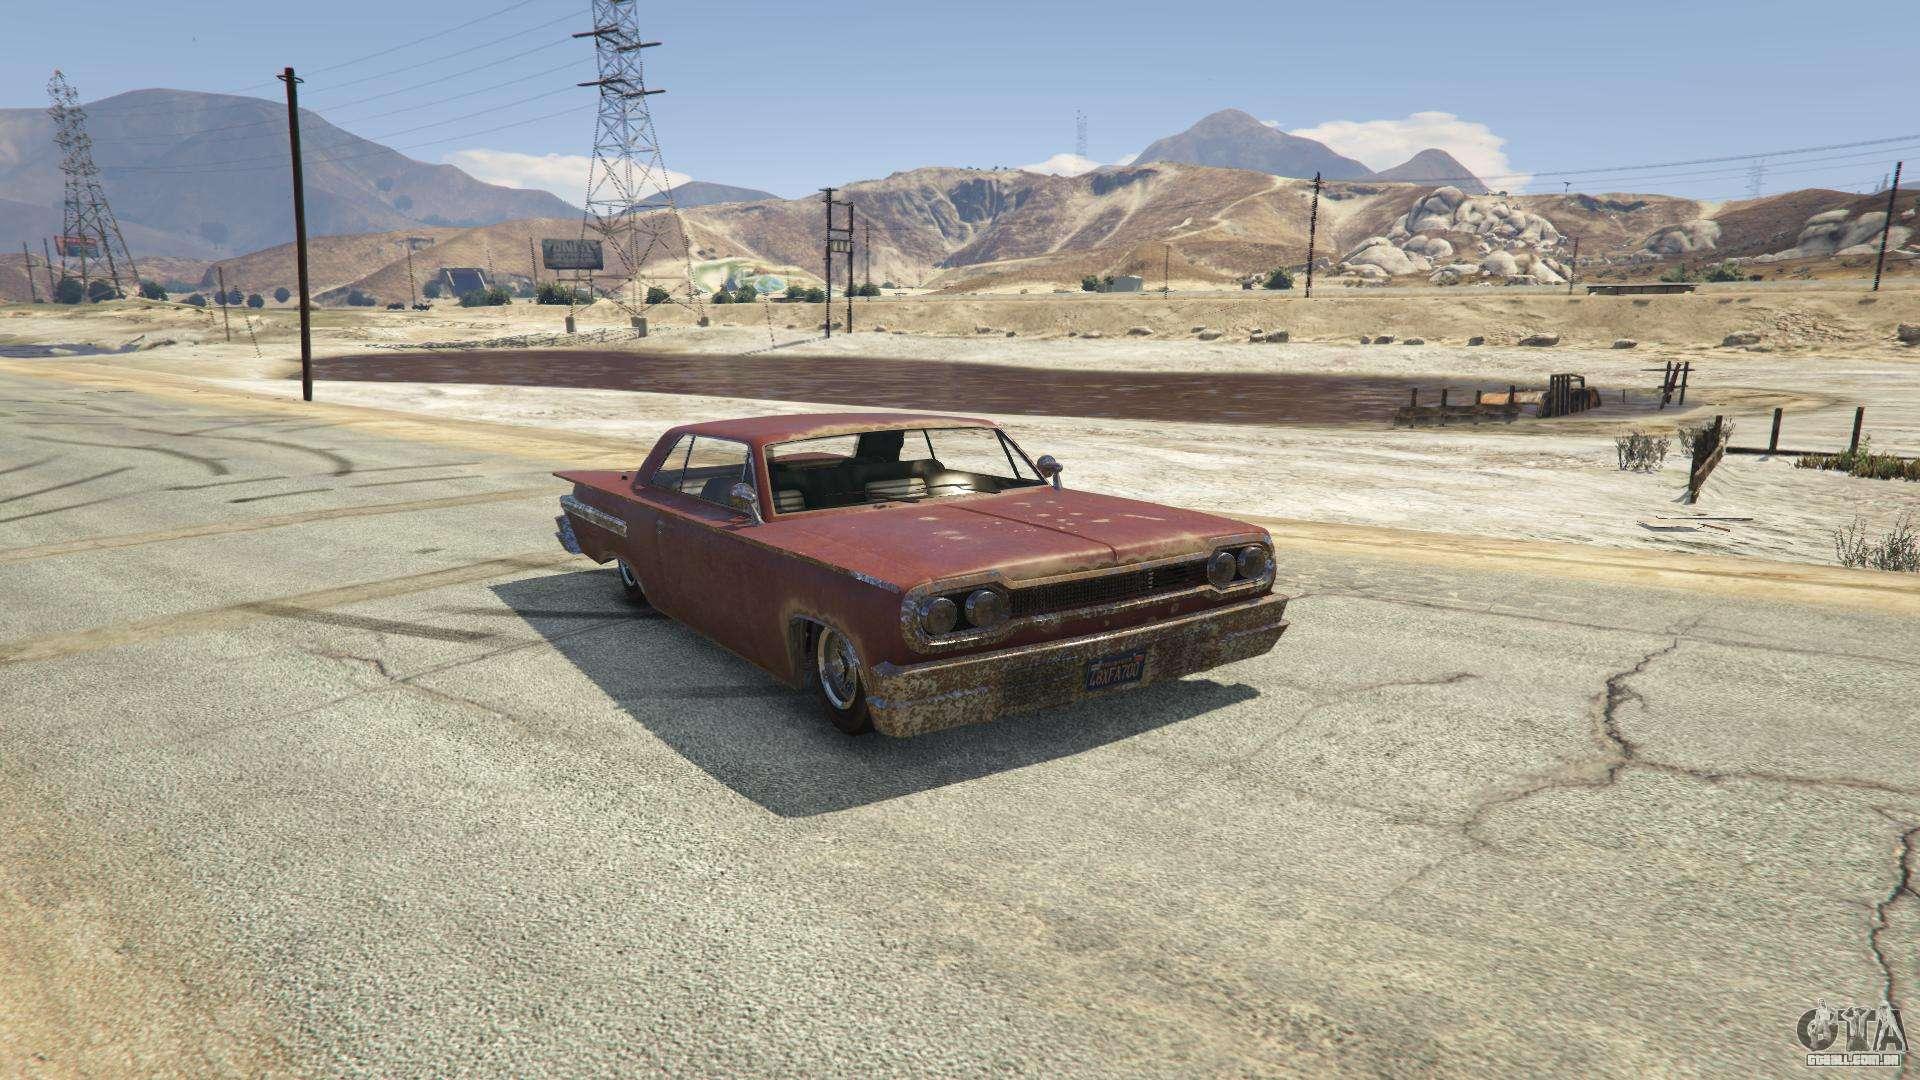 Voodoo do GTA 5 - vista frontal